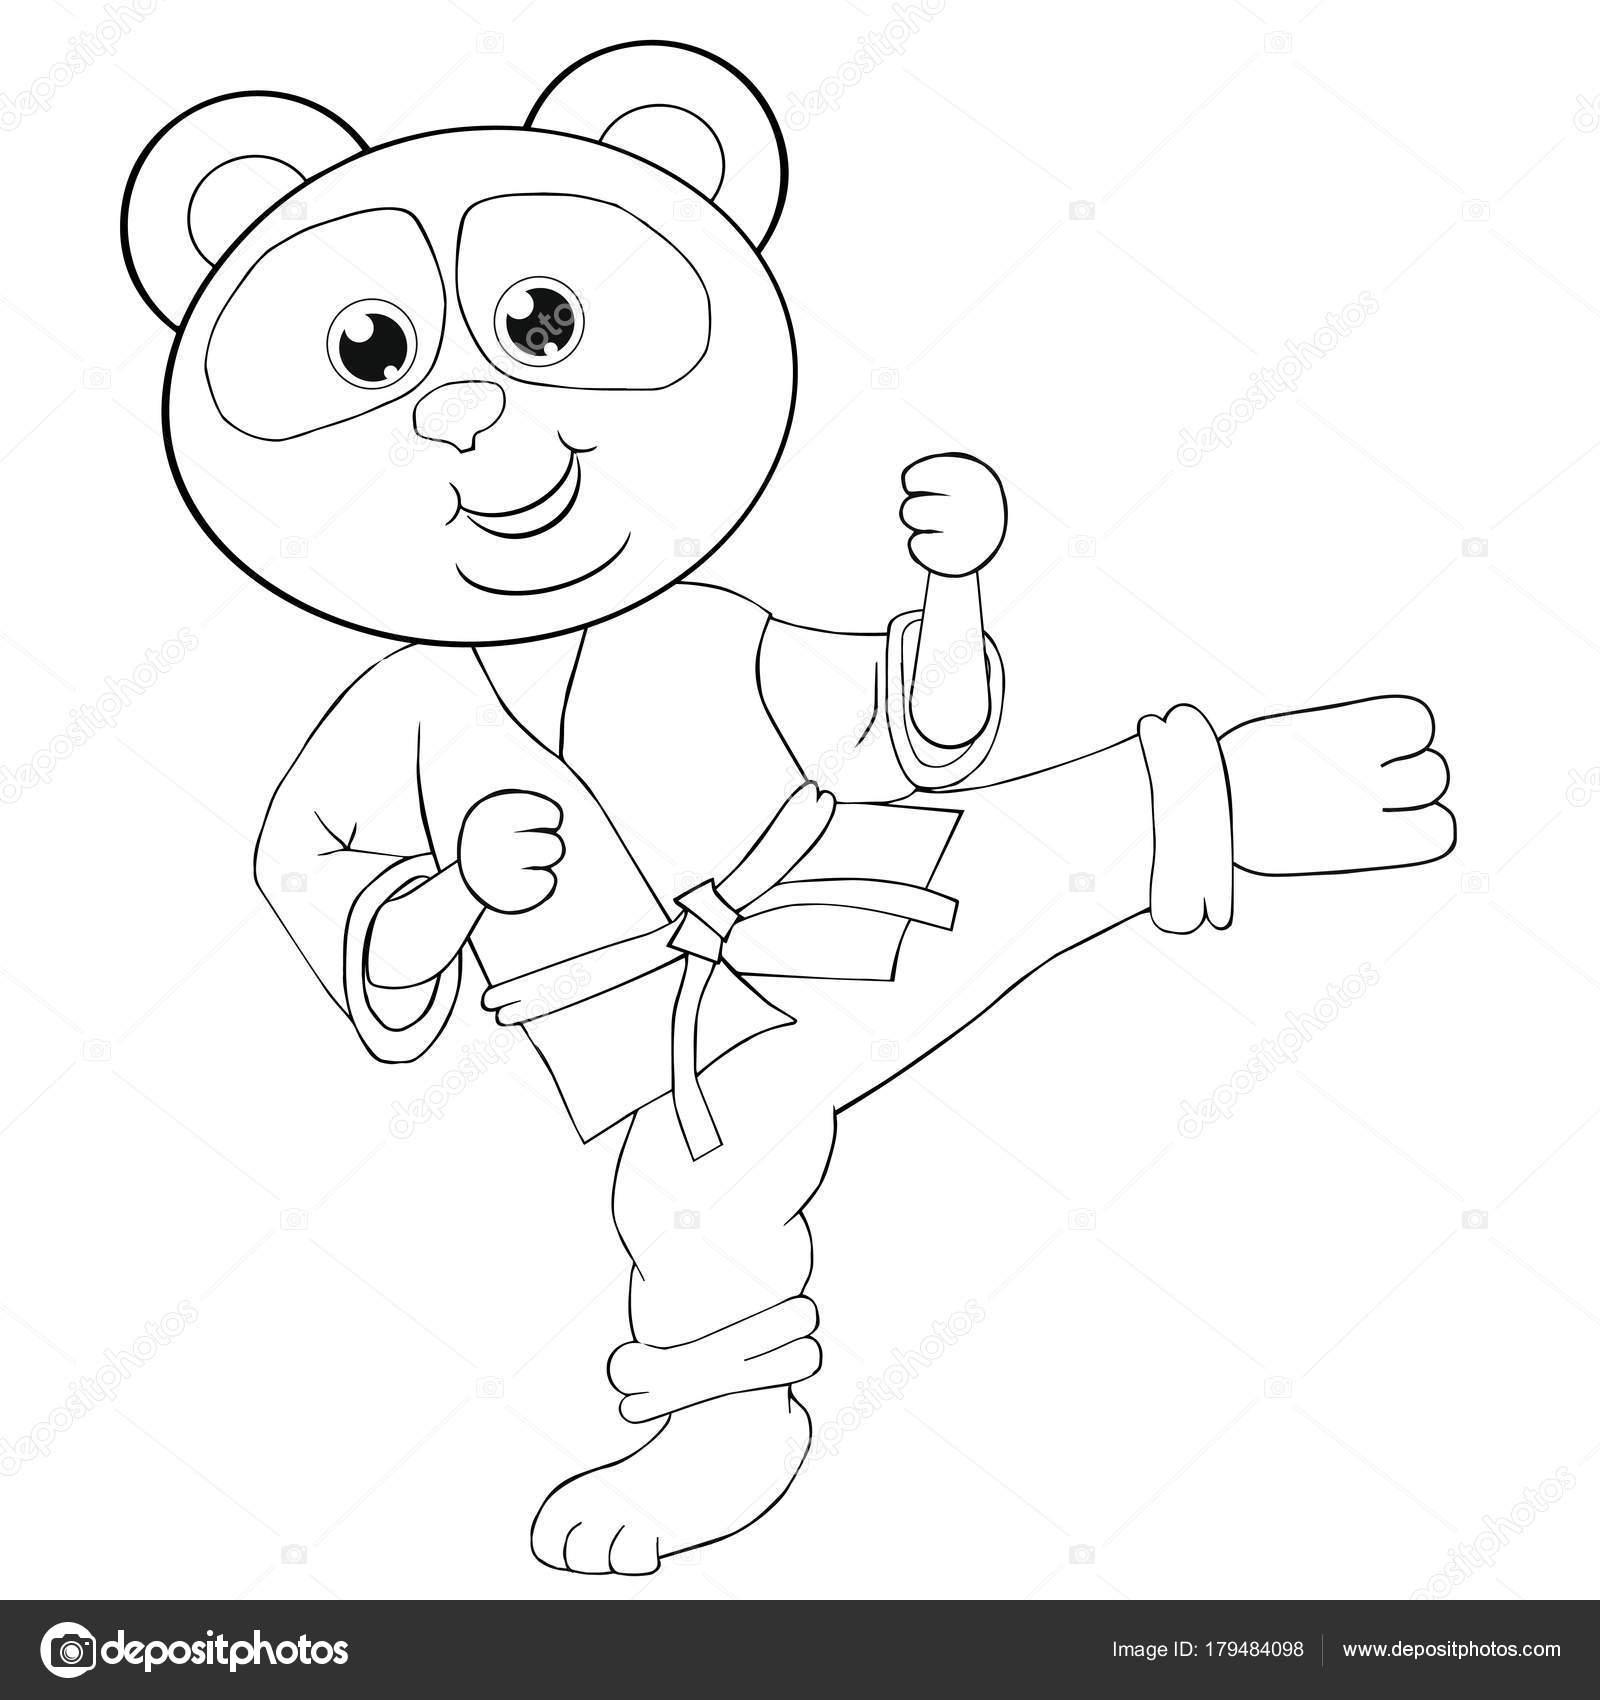 Animado Karate Para Colorear Panda Karate Libro Para Colorear